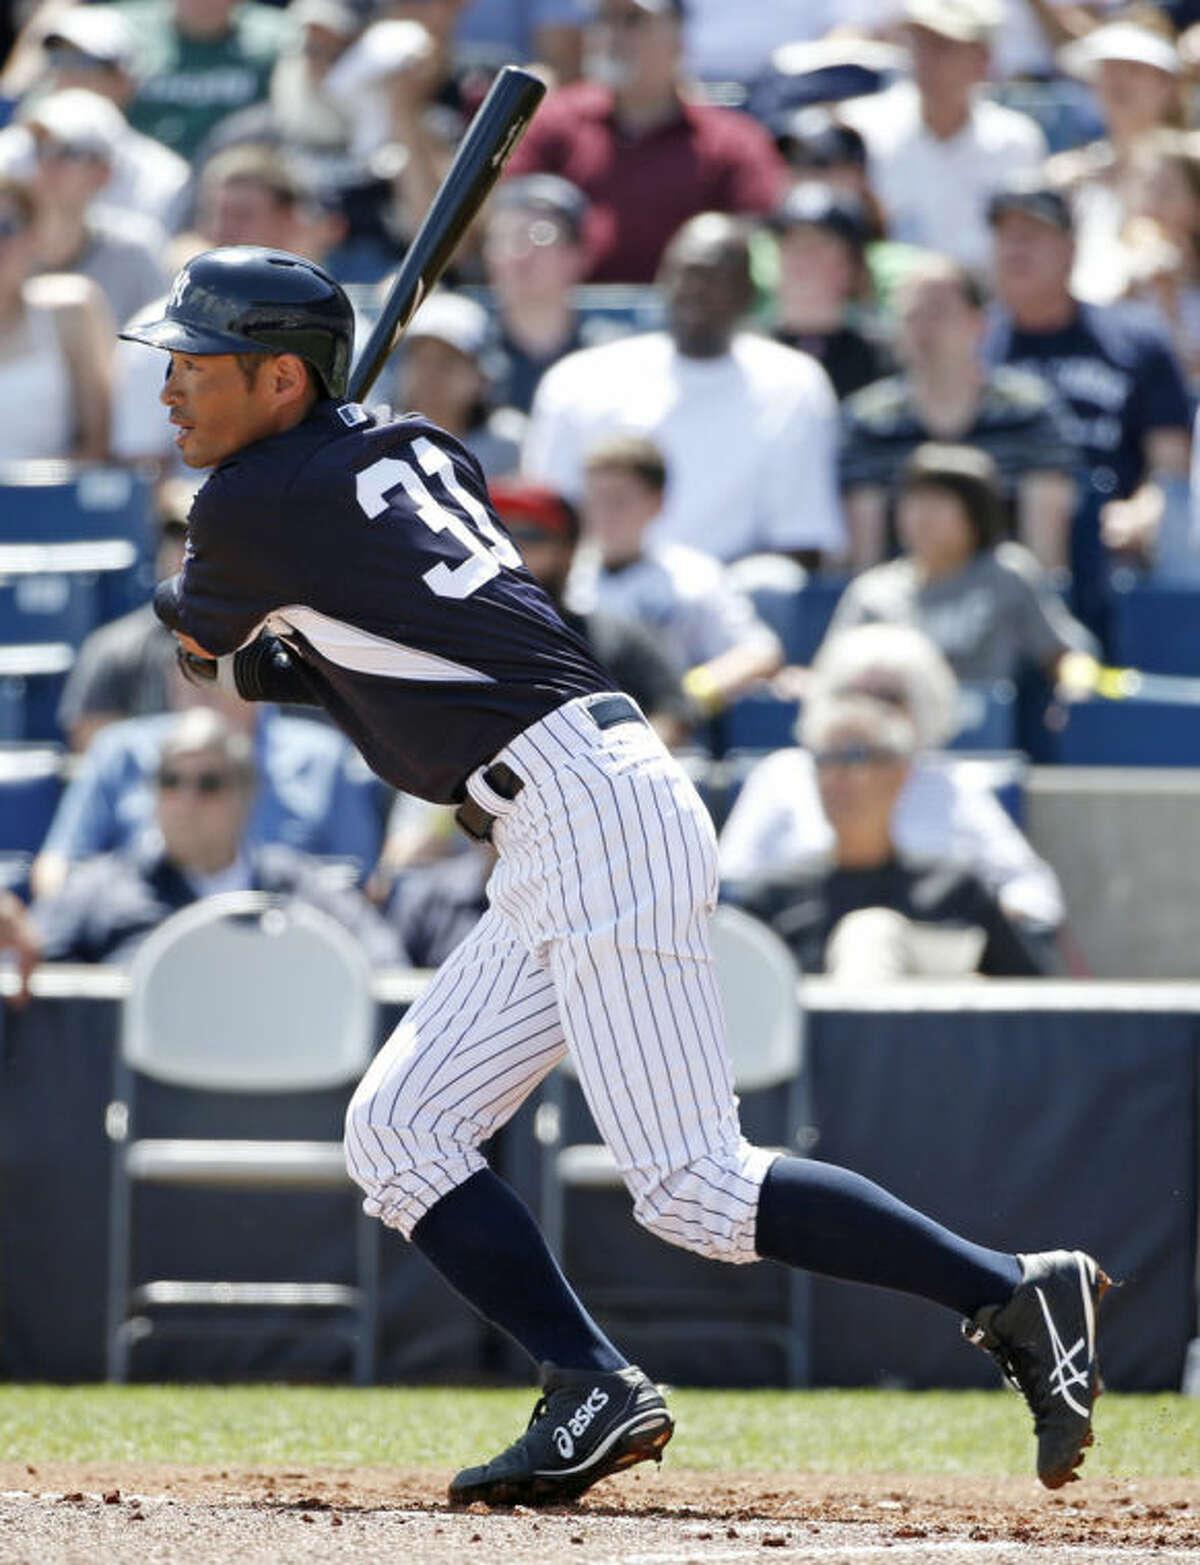 New York Yankees' Ichiro Suzuki hits a first-inning double off Atlanta Braves starting pitcher Julio Teheran in a spring exhibition baseball game in Tampa, Fla., Sunday, March 16, 2014. (AP Photo/Kathy Willens)